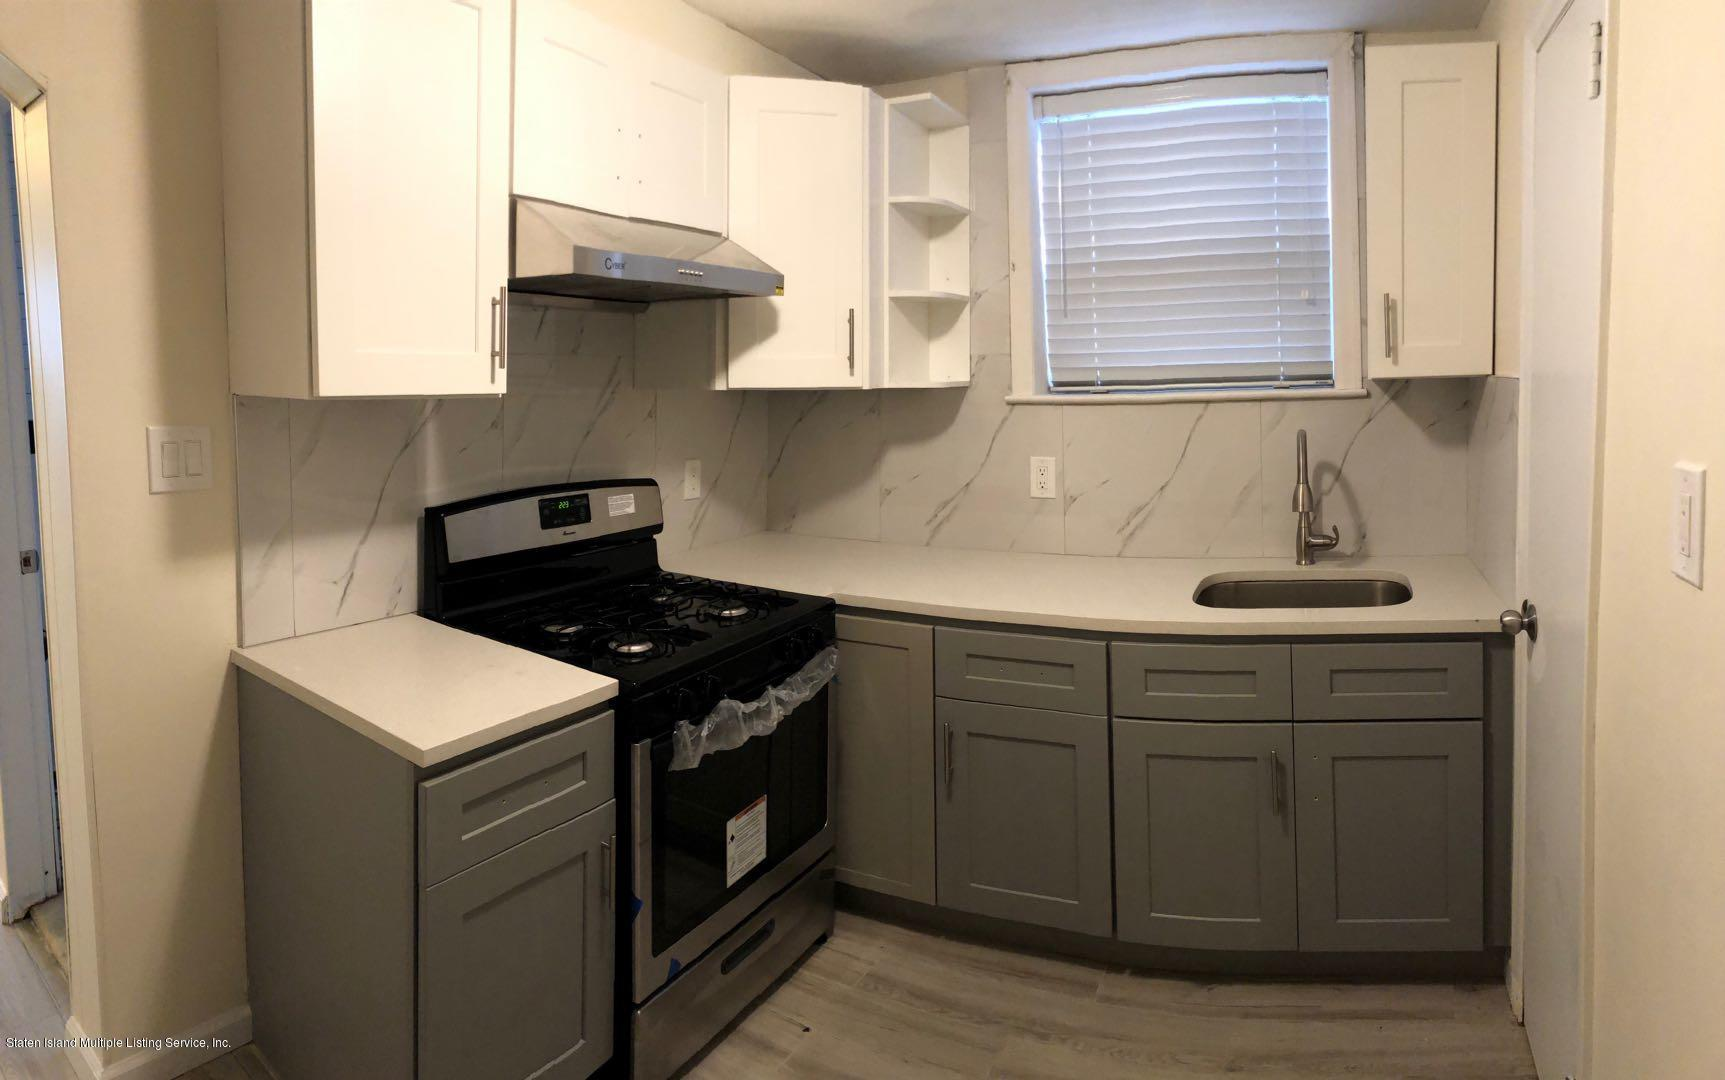 Two Family - Detached 27 Arthur Avenue  Staten Island, NY 10305, MLS-1128566-10